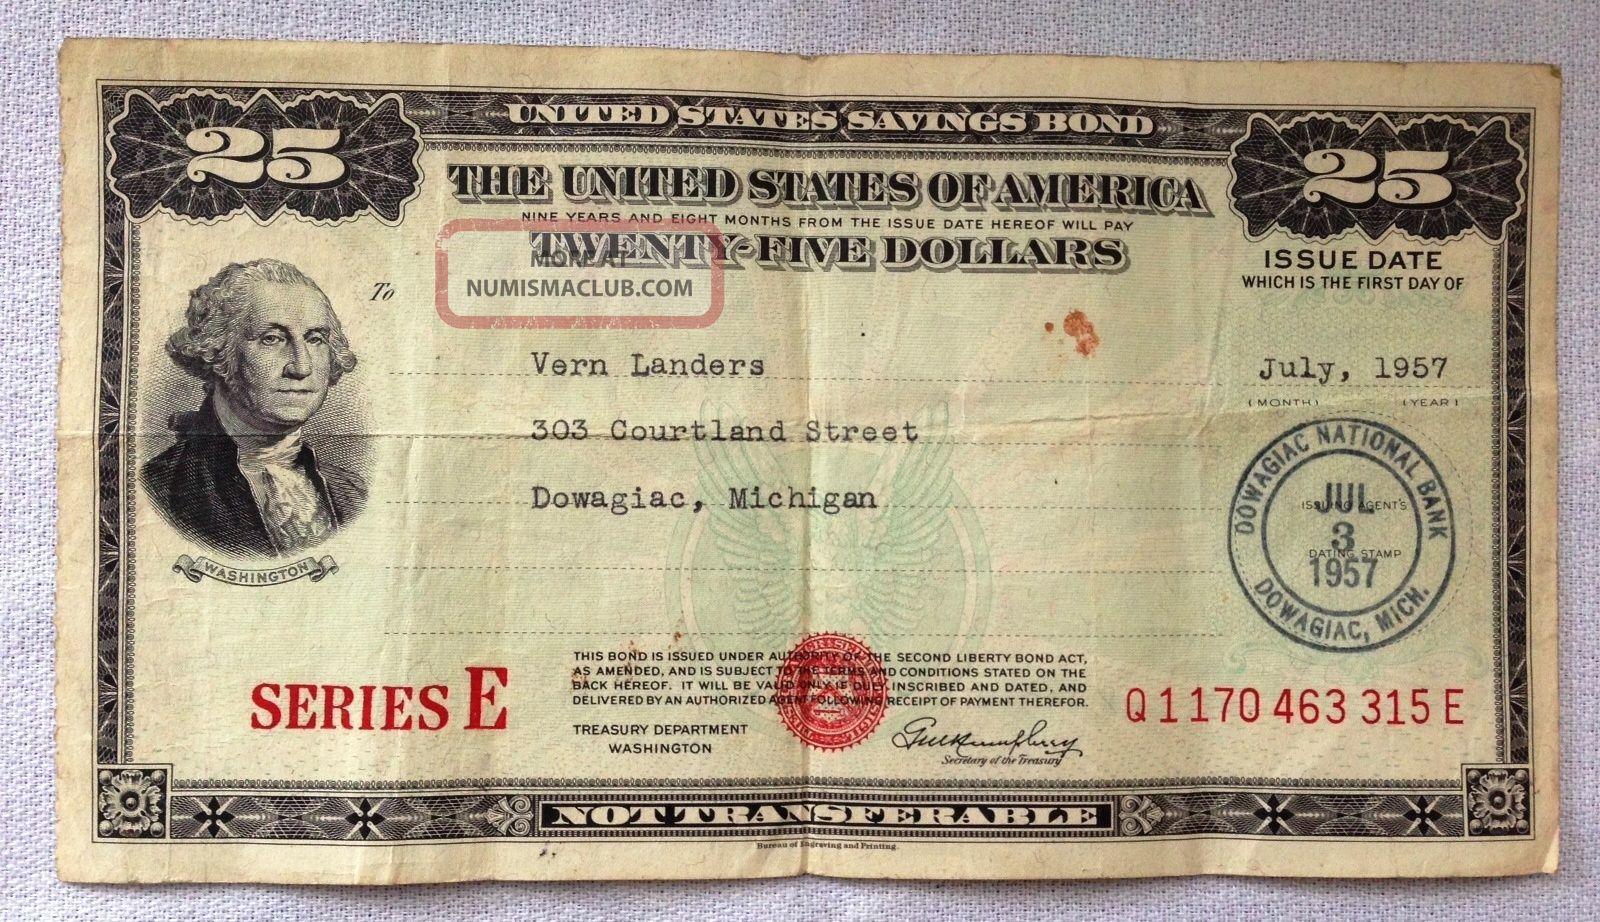 Us Savings Bond - Series E - $25 - July 1957 - 315e Stocks & Bonds, Scripophily photo